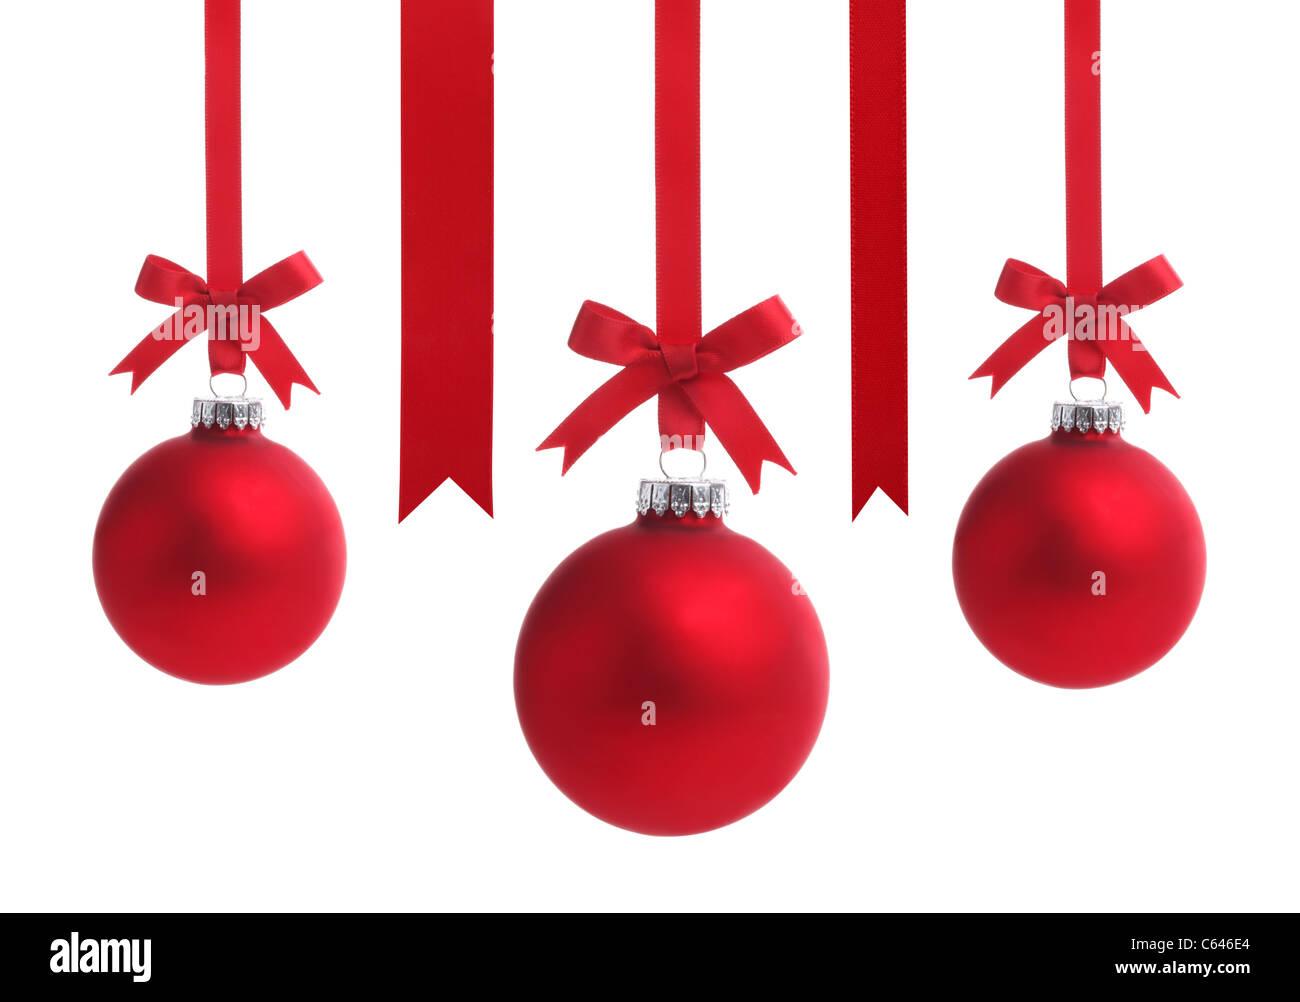 Bola de Navidad roja con cinta bow,aislado sobre fondo blanco. Imagen De Stock